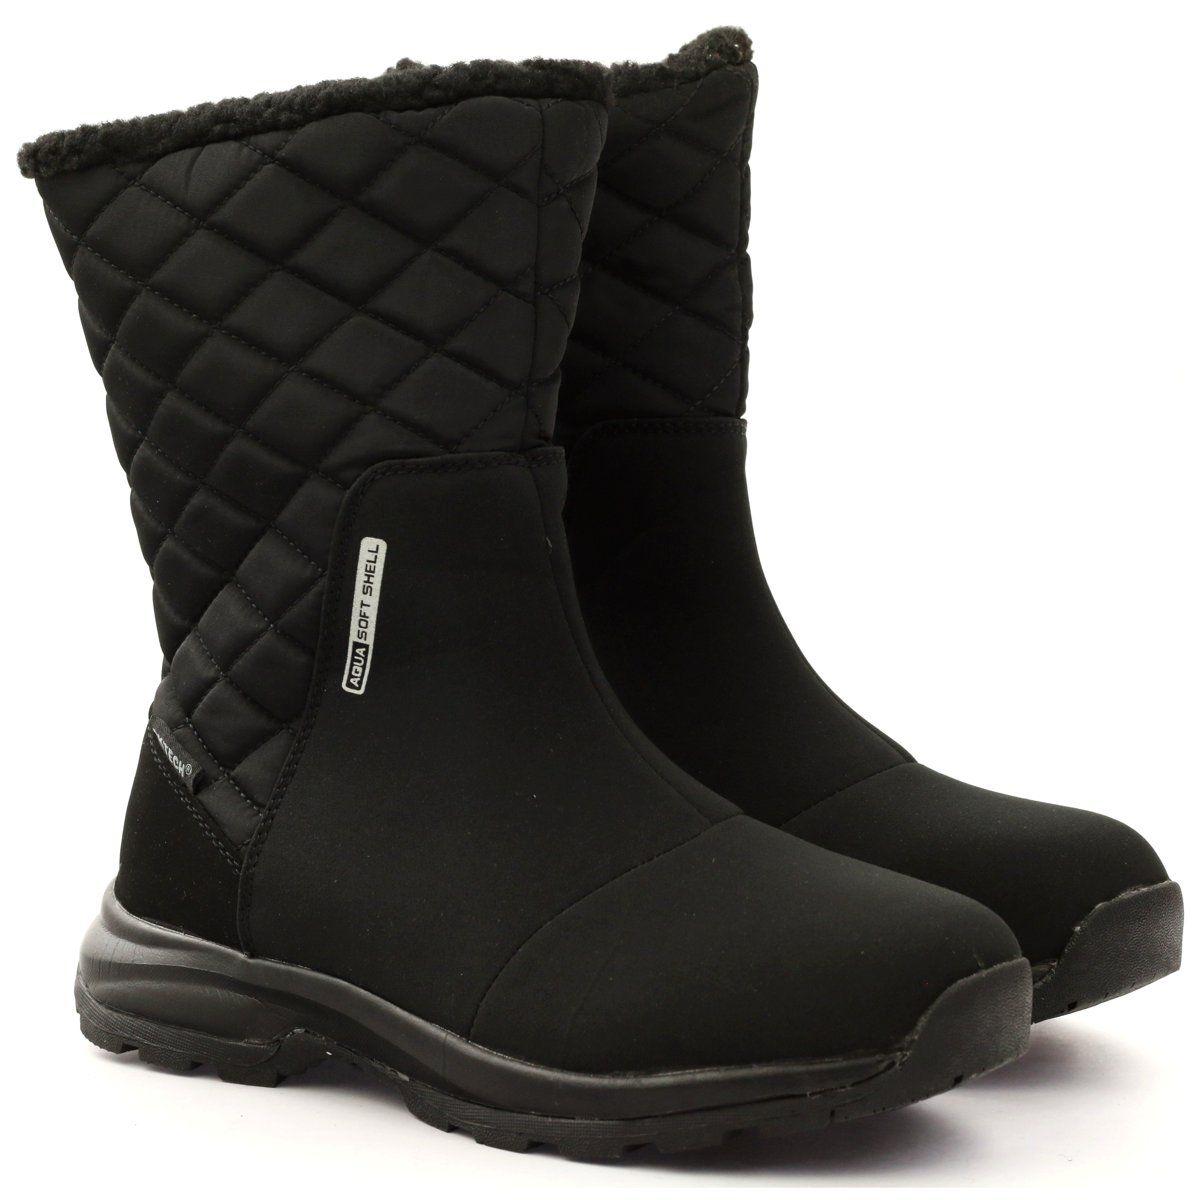 Kozaki Z Membrana Pikowane Dk 17137 Czarne Boots Shoes Winter Boot